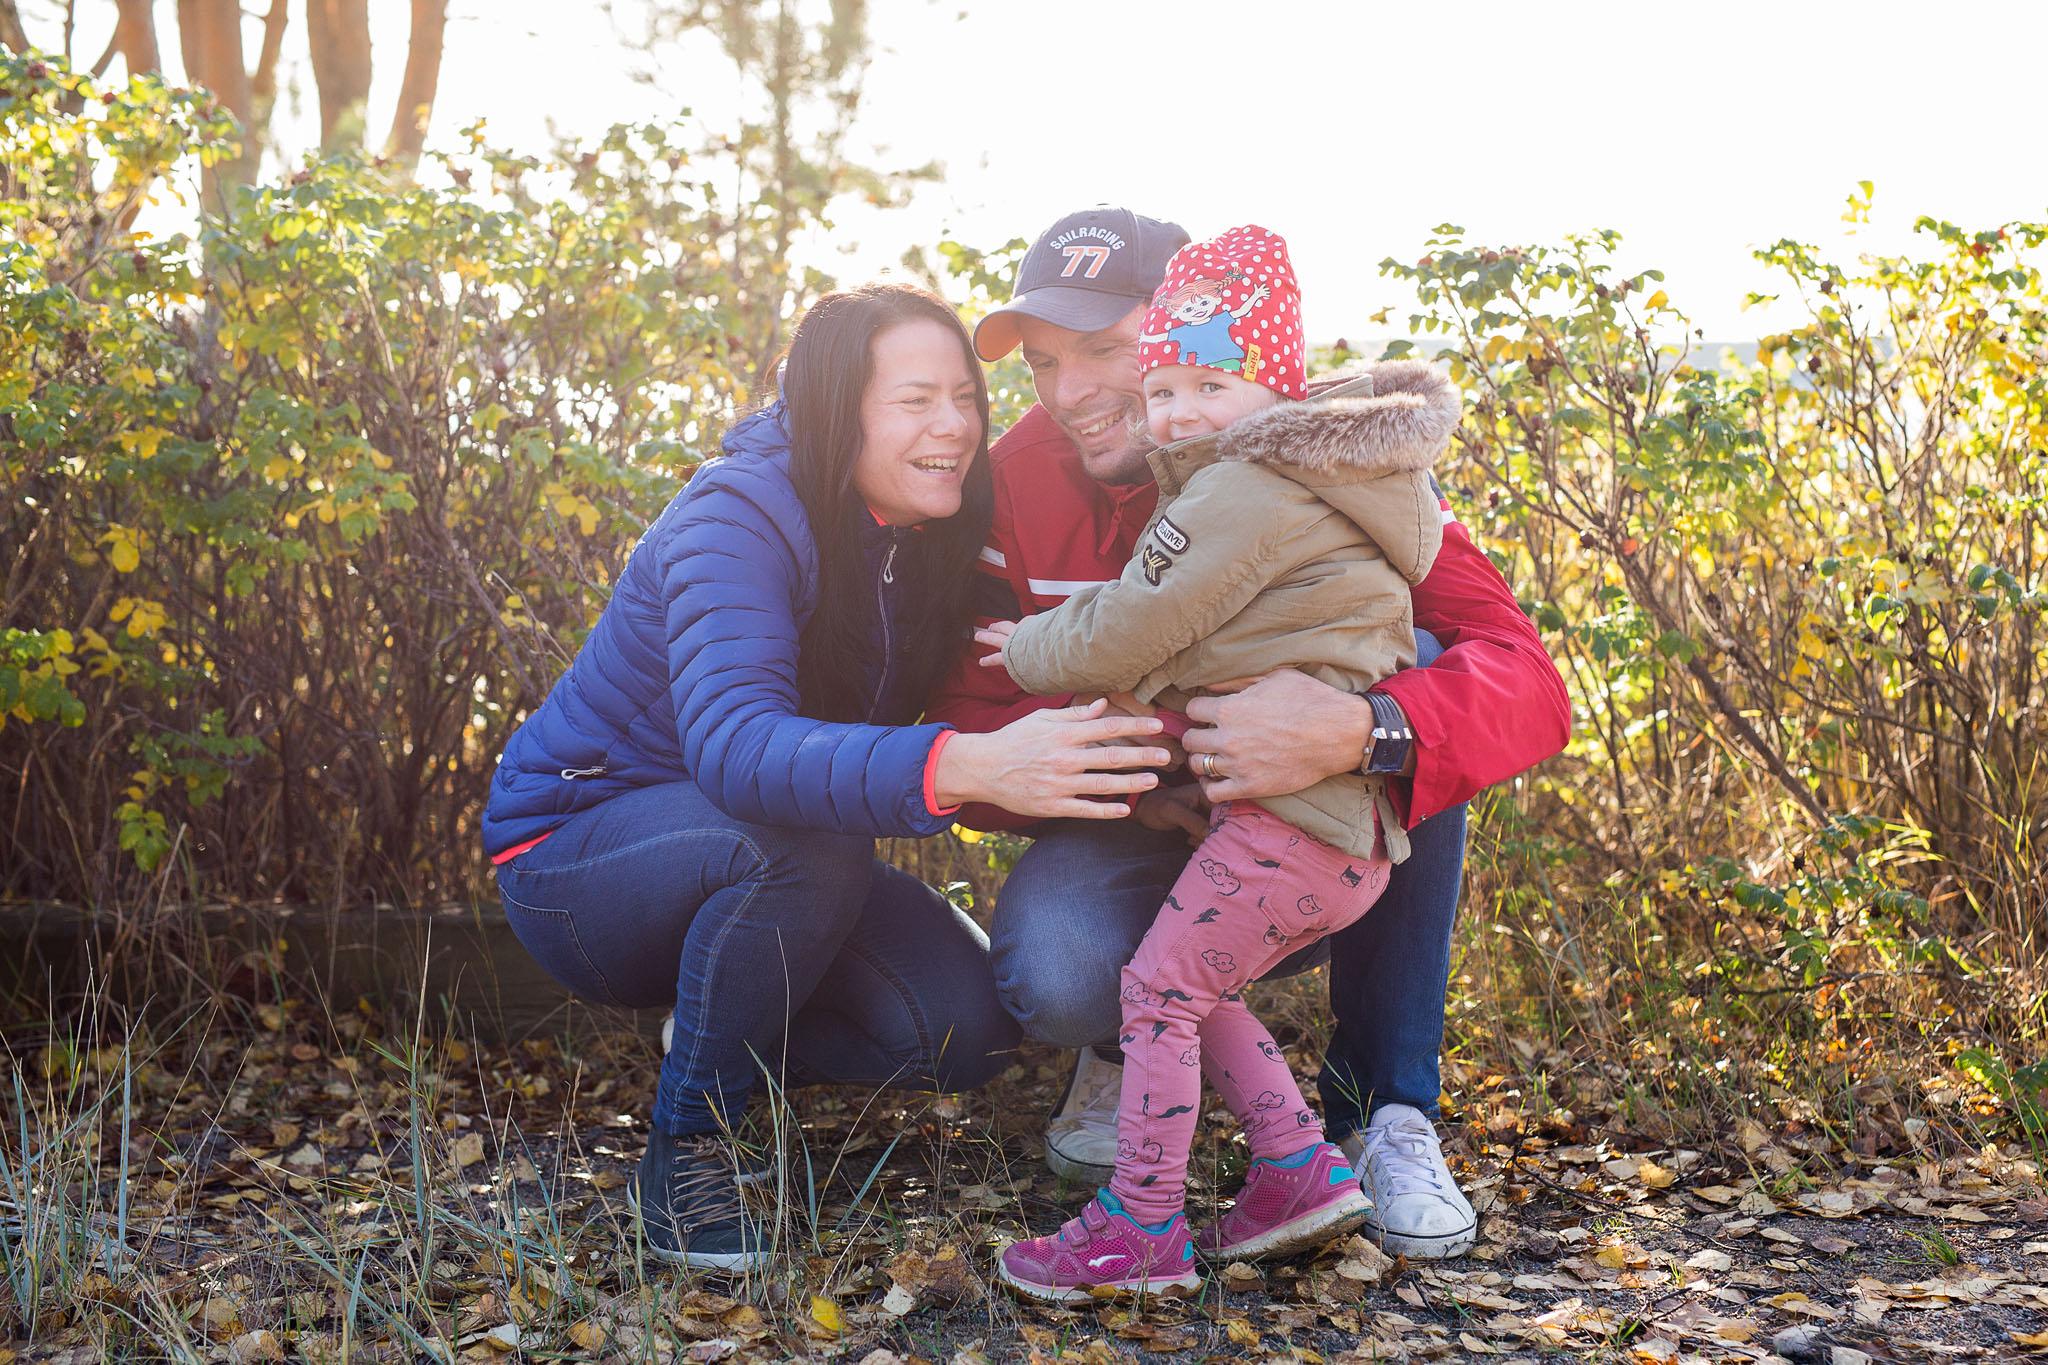 fotograf sabina wixner hudiksvall barn familj 2.jpg